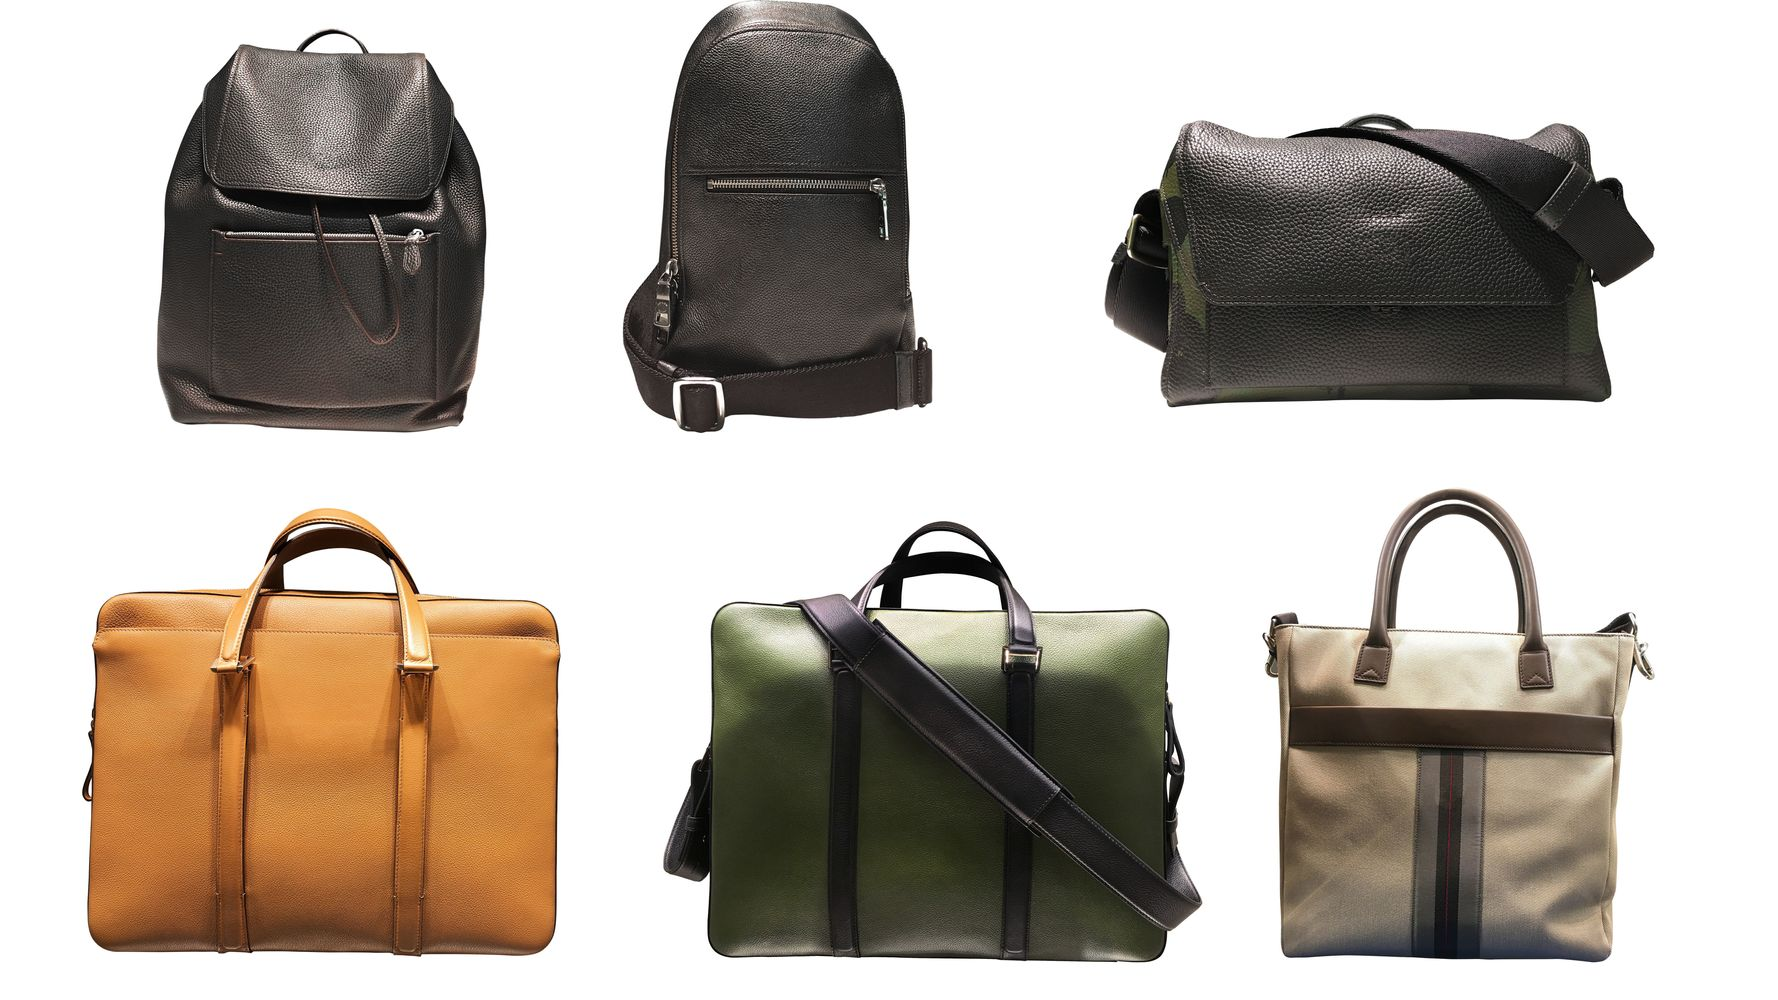 Briefcase Messenger Shoulder Bag for Men Women Garfield Laptop Bag Laptop Case